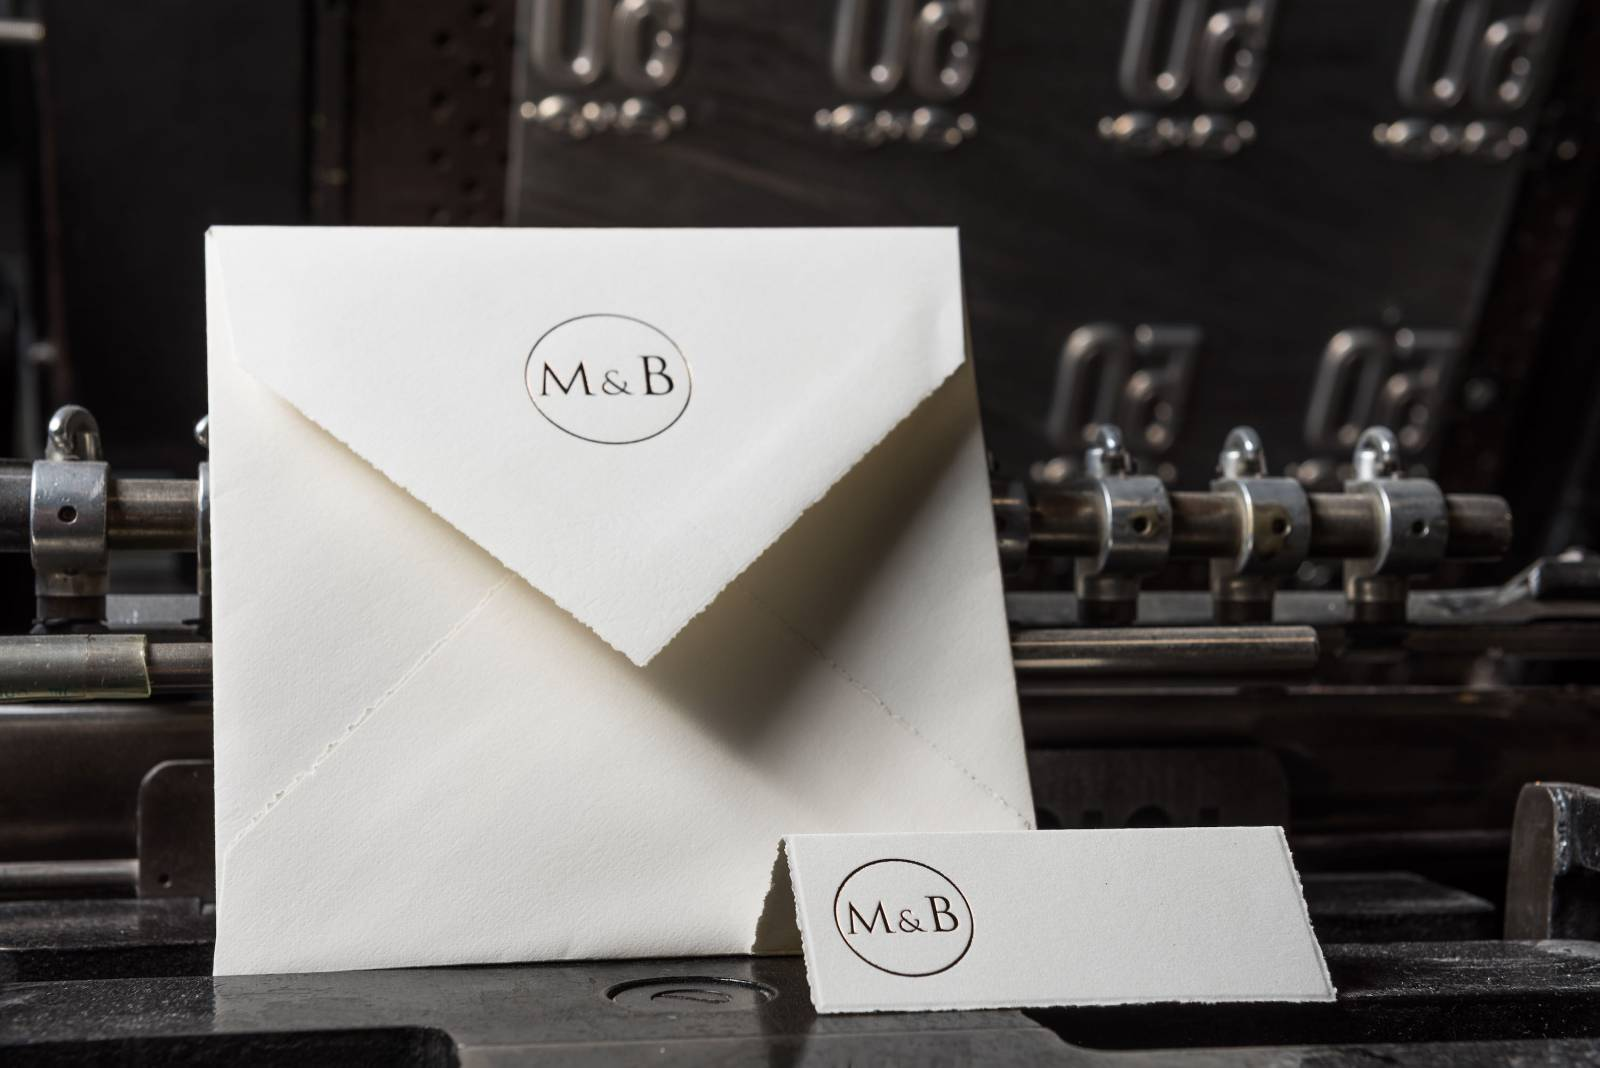 Atelier Maurice - Klaas De Buysser - Trouwuitnodigingen en drukwerk - House of Weddings 4